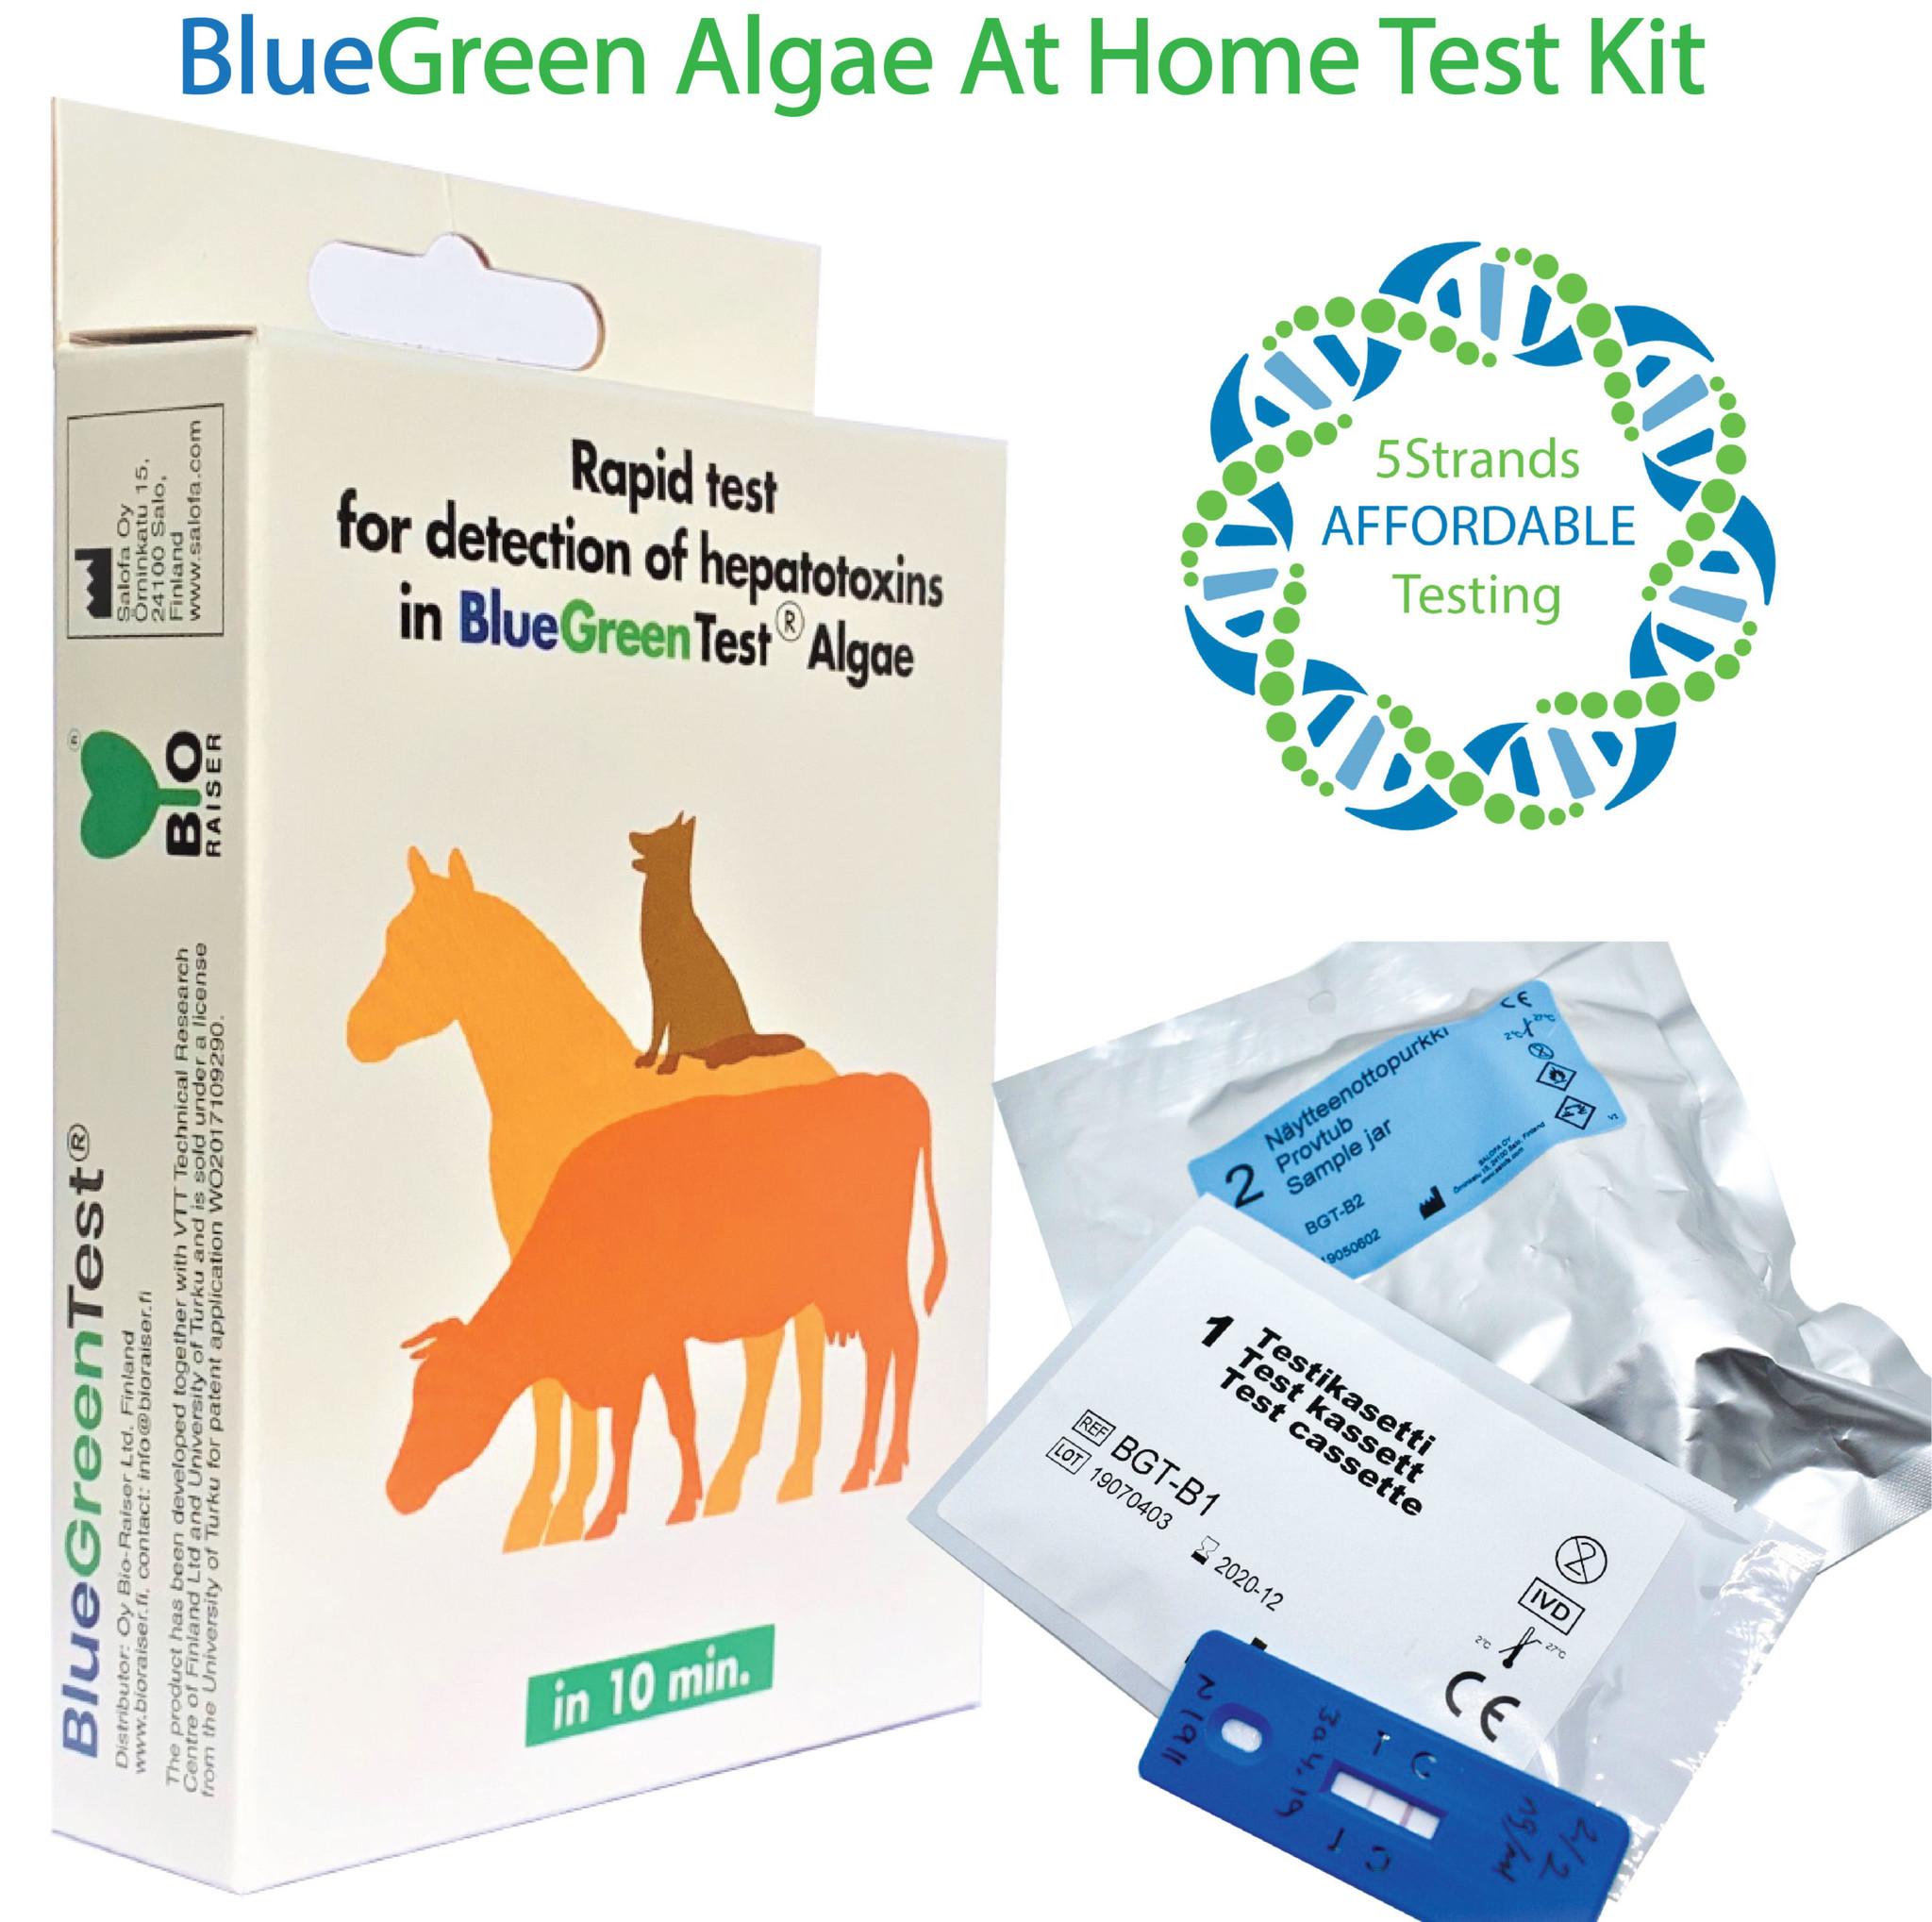 Bio-Raiser Bio-Raiser BlueGreenTest Algae Test Kit